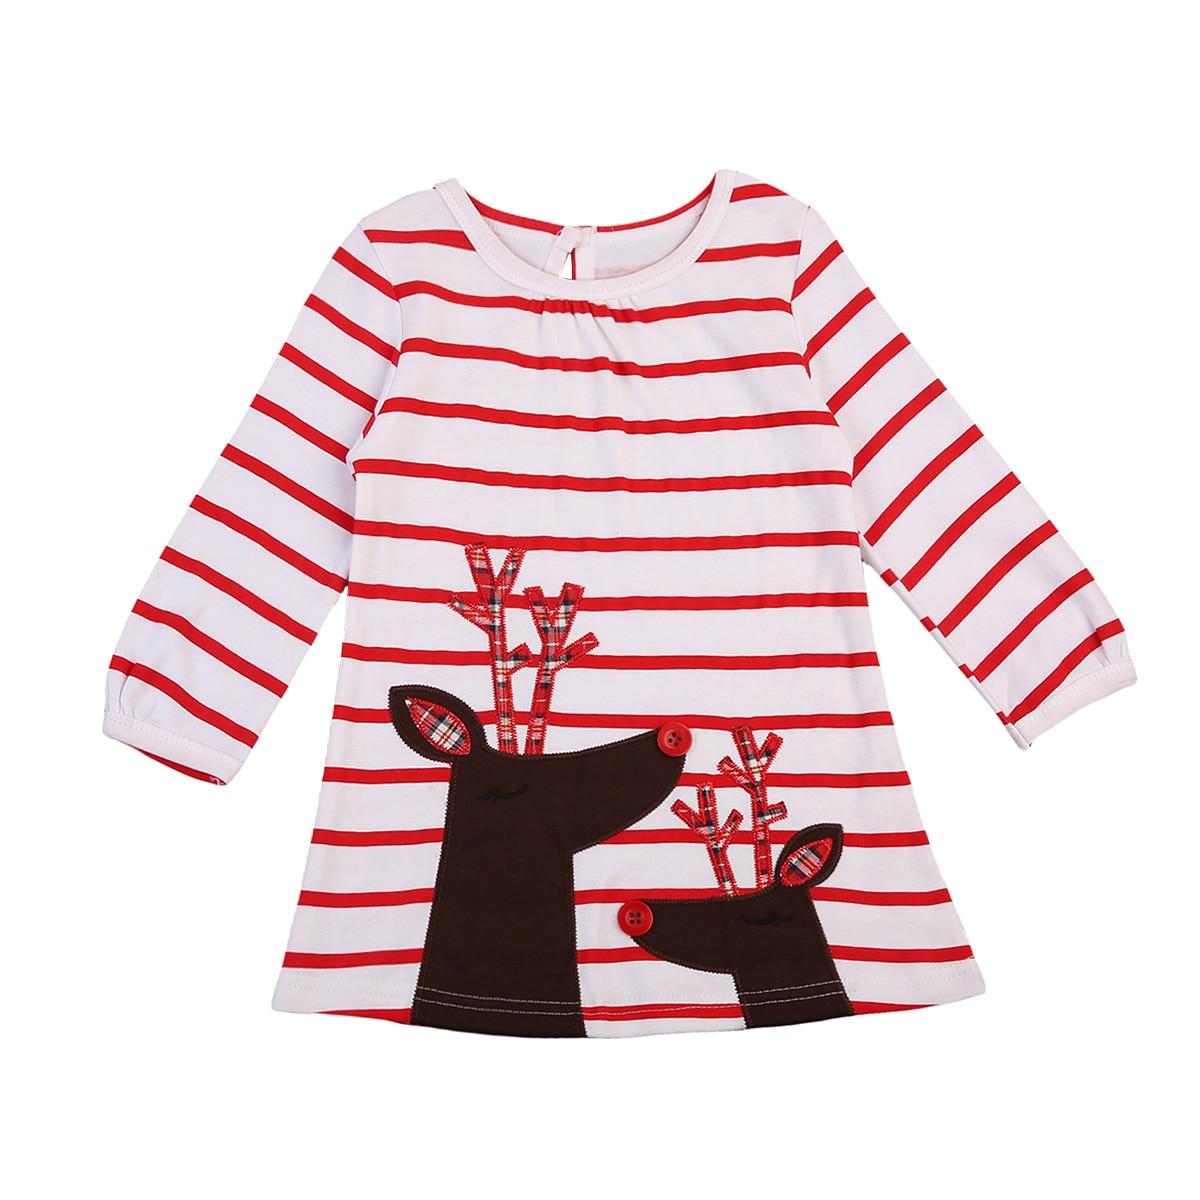 Christmas Dresses For Little Girls Bady Long Sleeve Dresses Winter Deer Patchwork Striped Dress Sundress 1-7Y vertical striped patchwork expansion maxi dress